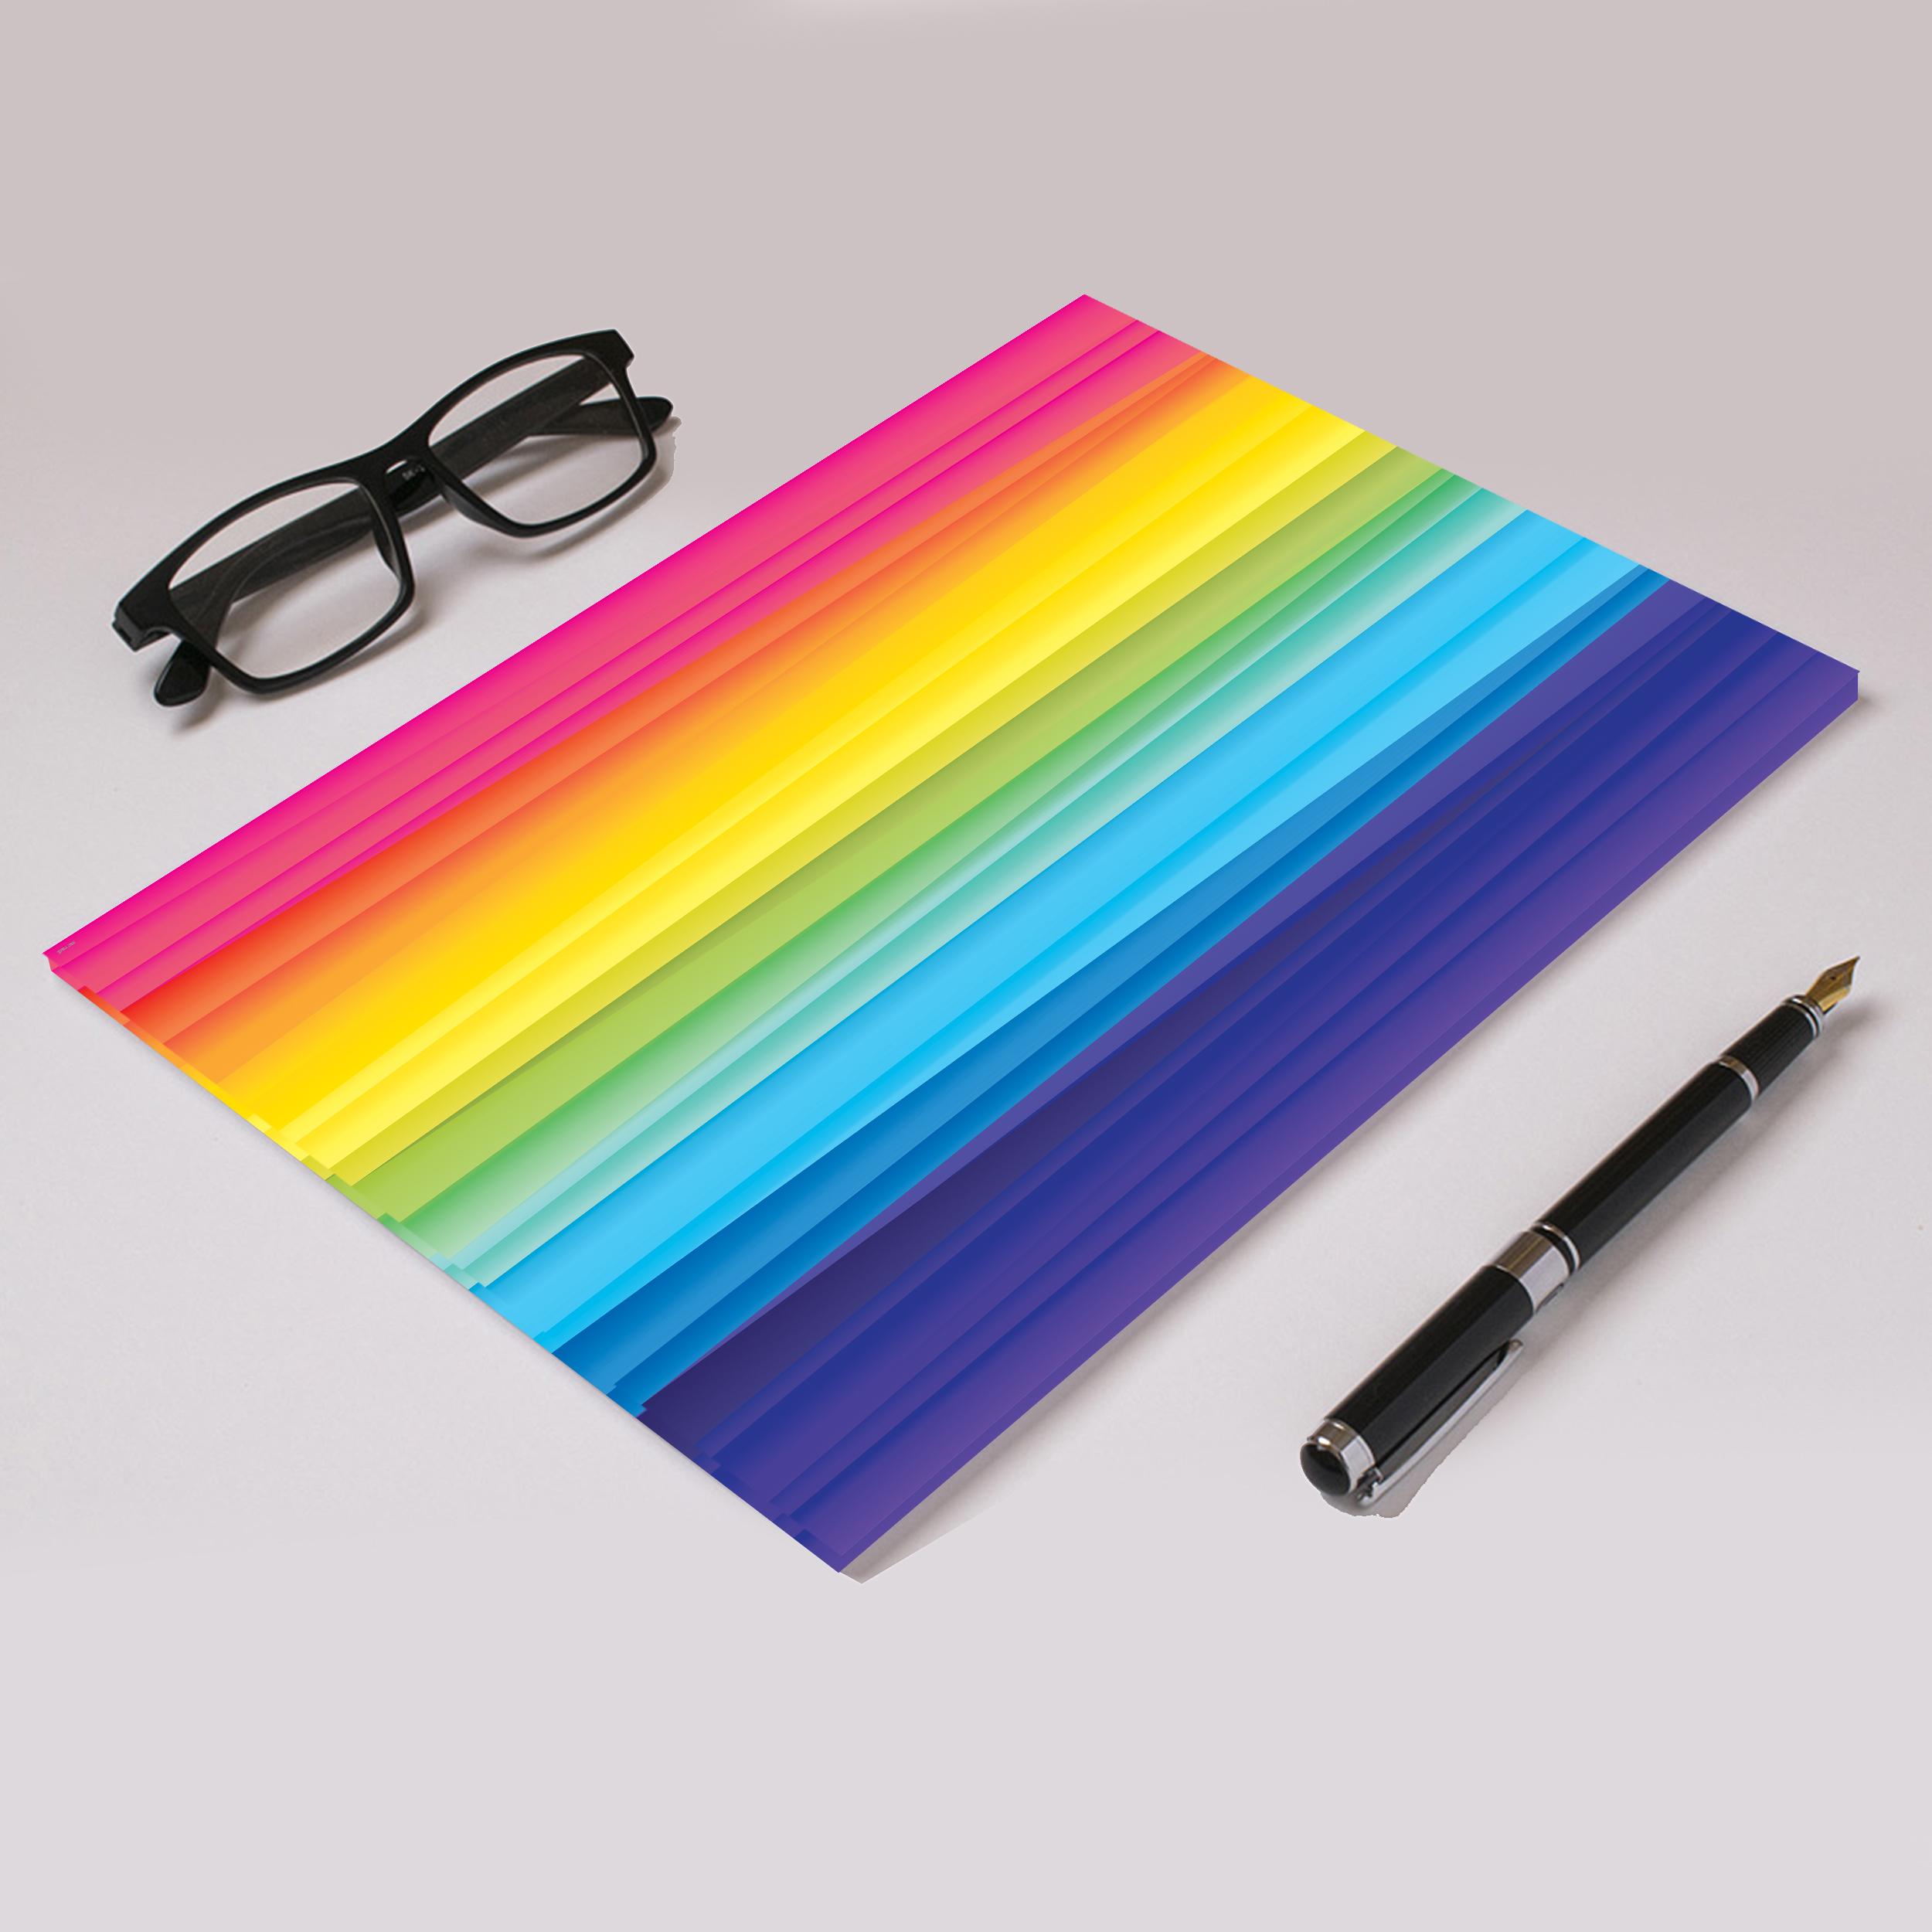 کاغذ رنگی A4 مستر راد مدل رنگارنگ بسته 10 عددی main 1 10